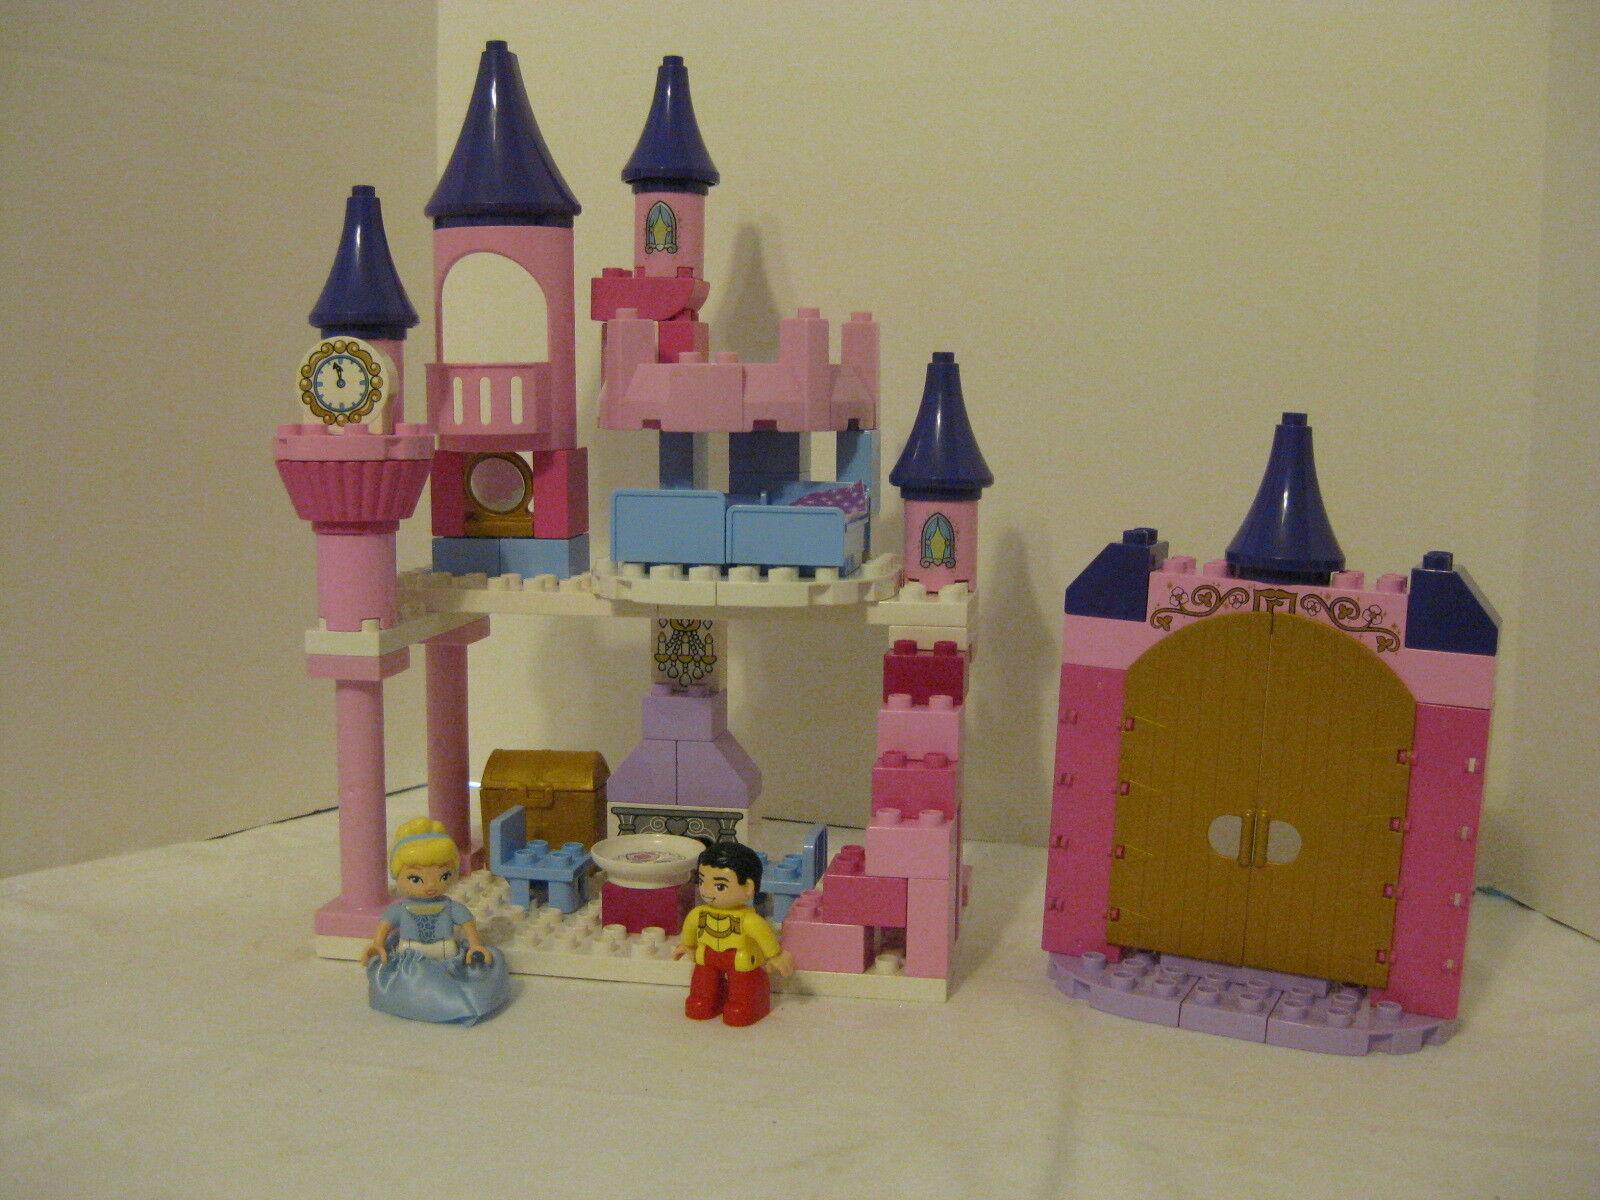 Duplo Legos Pastel Cinderella Castle with Figures 6154 golden Gates Complete NM